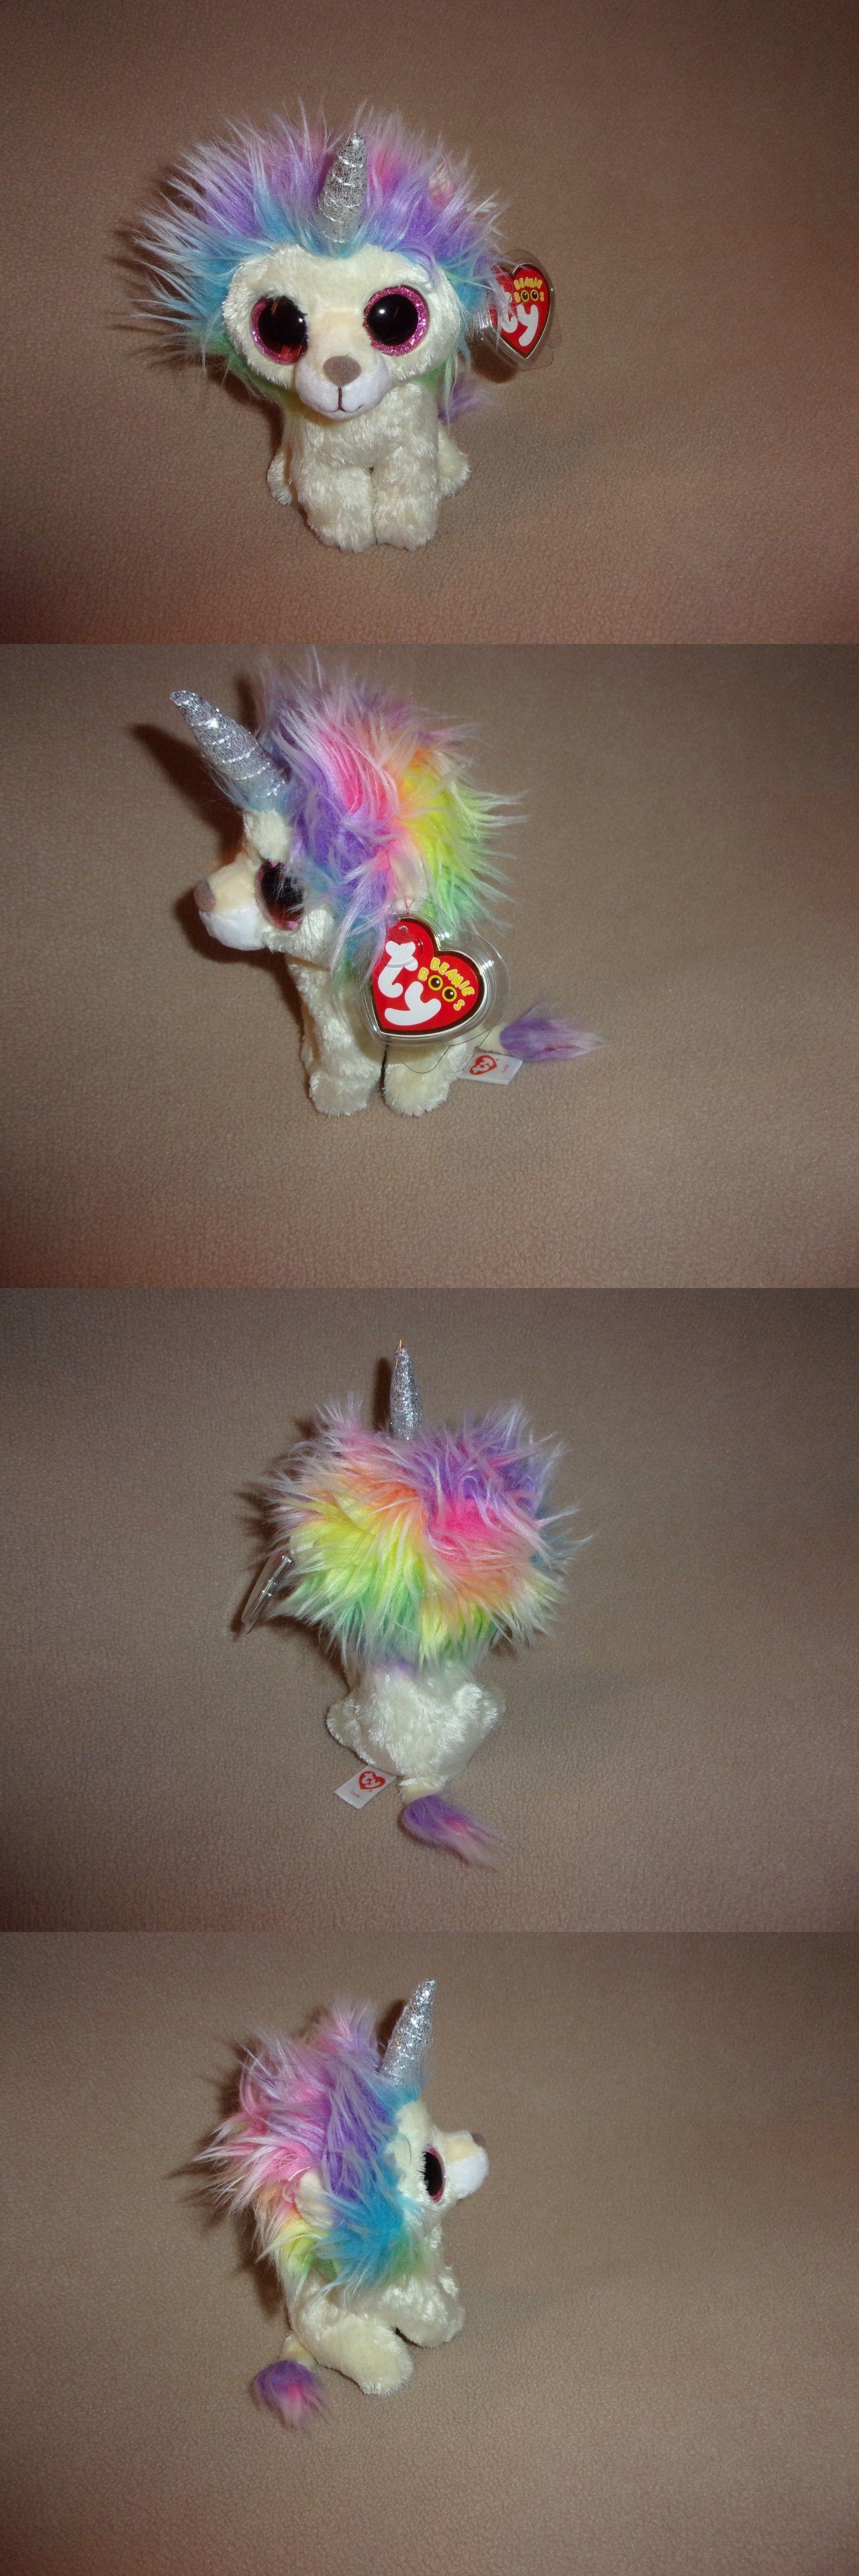 5cdaddc08ef Other Ty Beanbag Plush 1037  Ty Mwmt Layla The Rainbow Unicorn Lion Beanie  Boo-